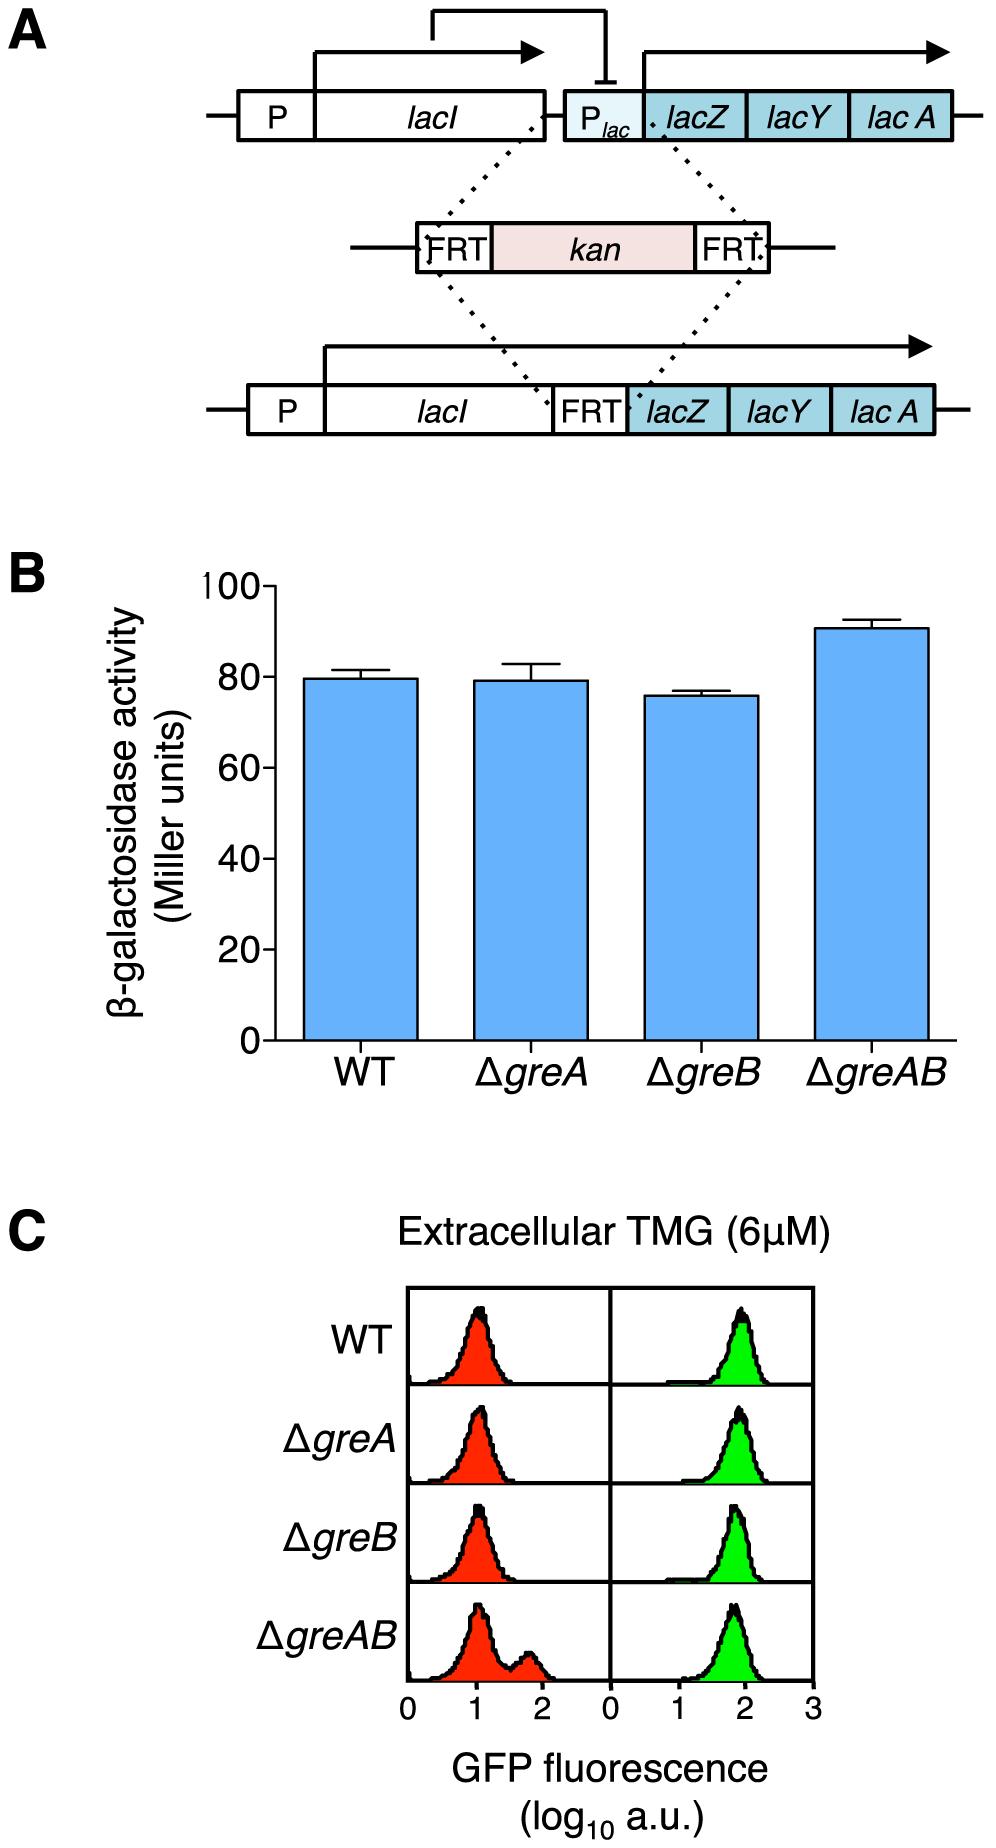 Creation of a <i>lacIZYA</i> operon fusion to assess the levels of gene expression from the <i>lacI</i> gene promoter.